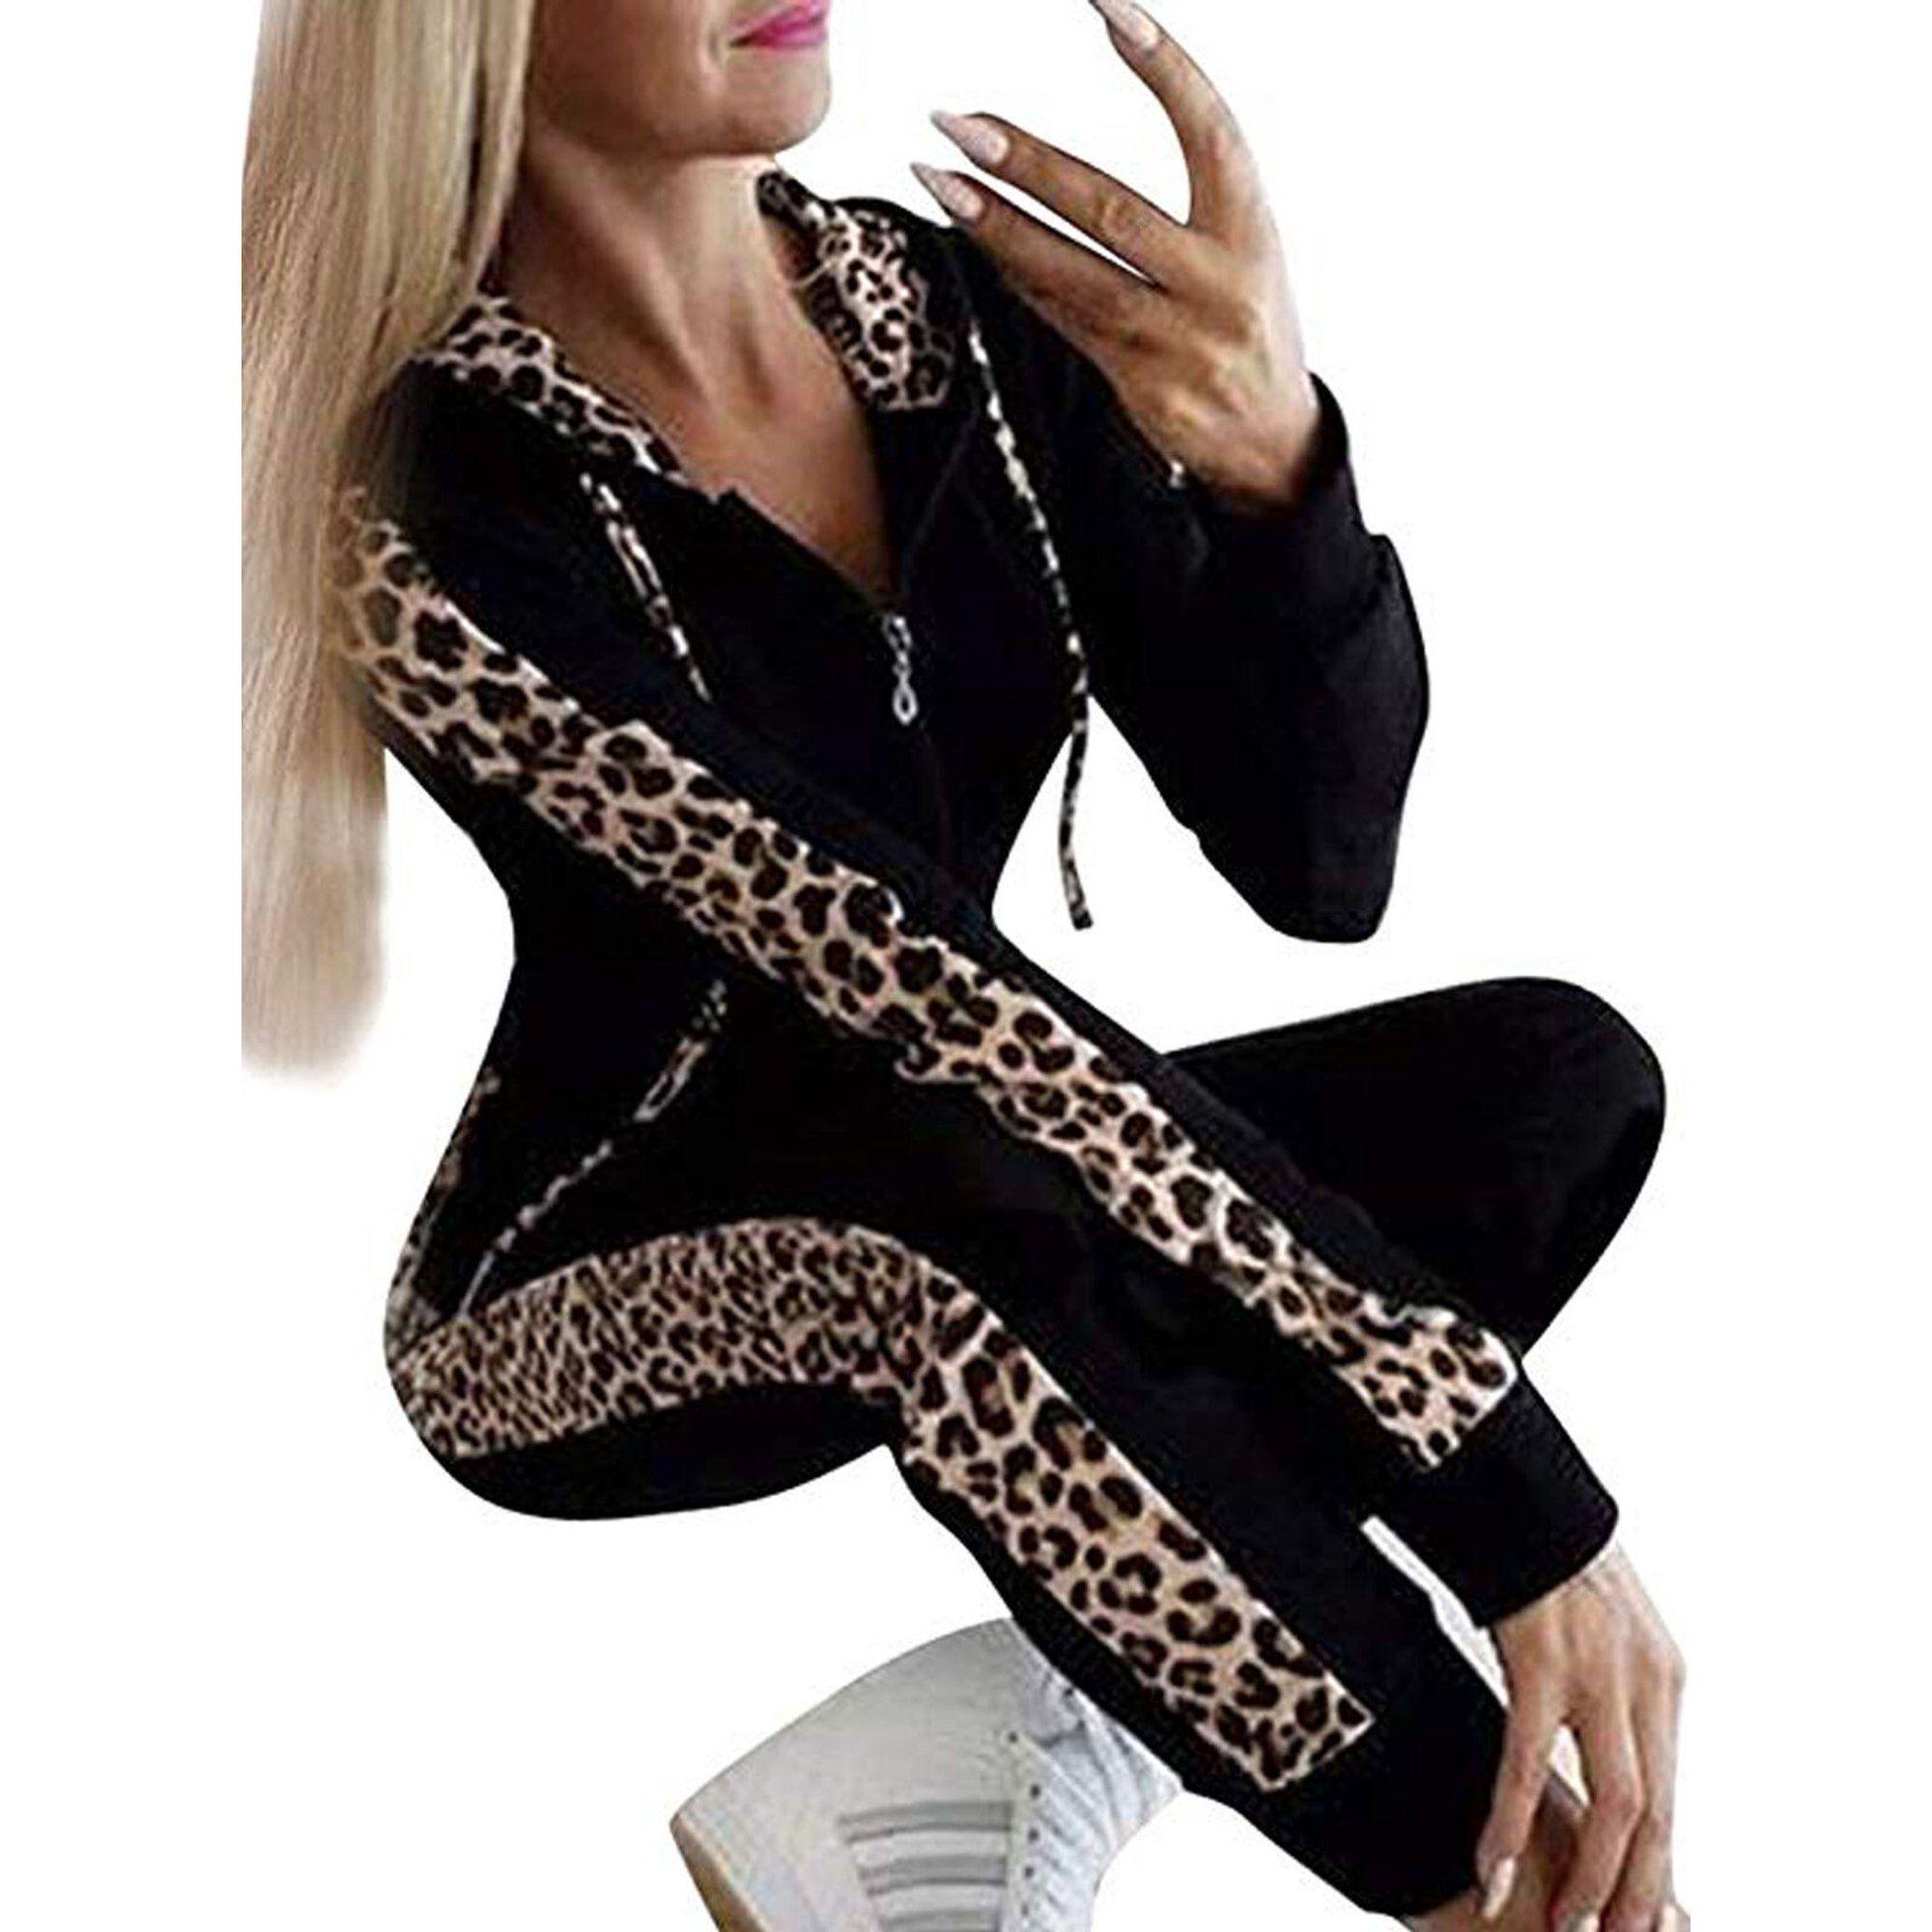 2PCS Women Tracksuits Set Lounge Wear Ladies Top Hoodies Suit Pants Loungewear